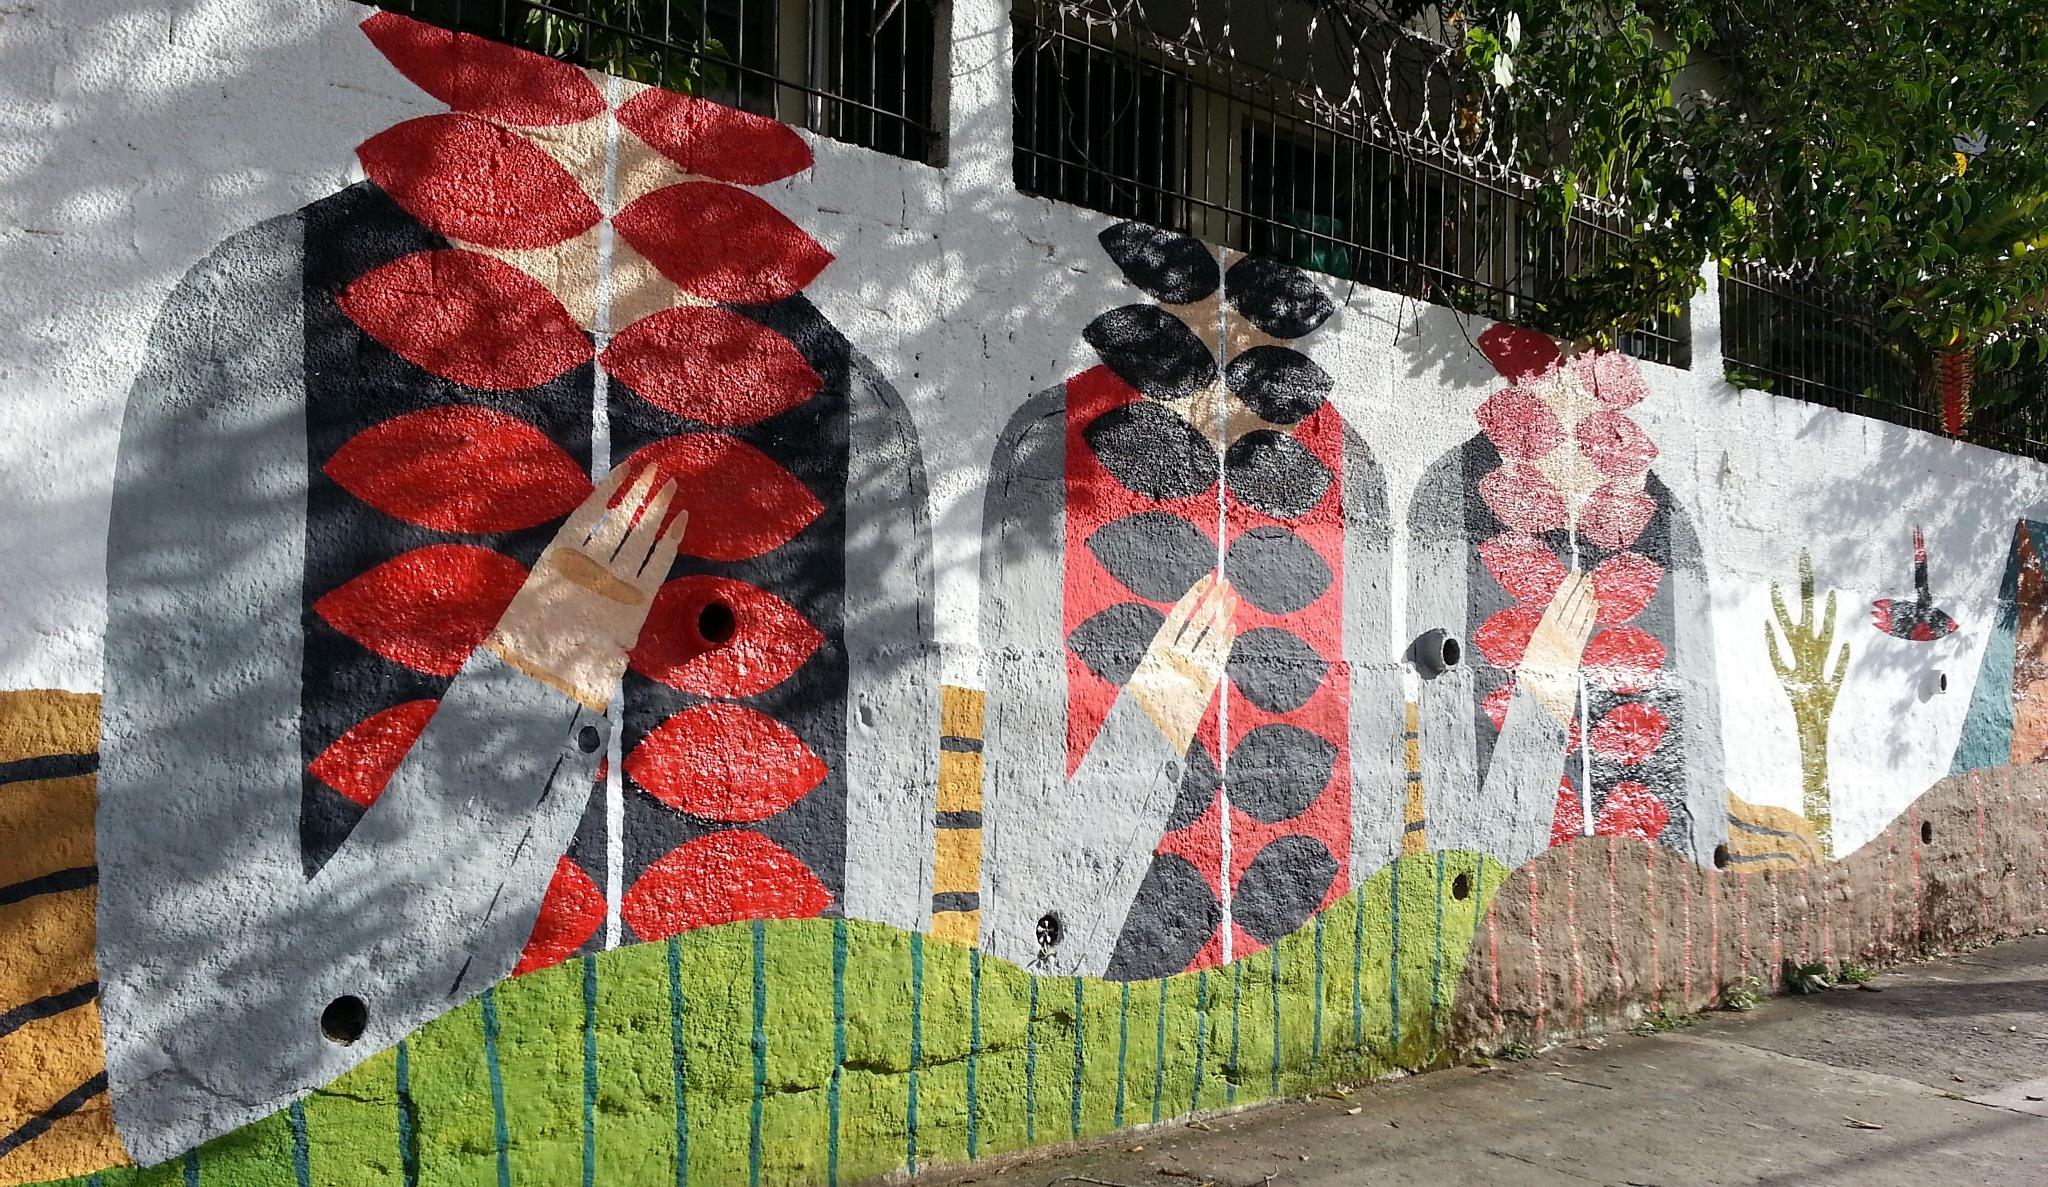 #streetartfromtheworlds by mário lellis